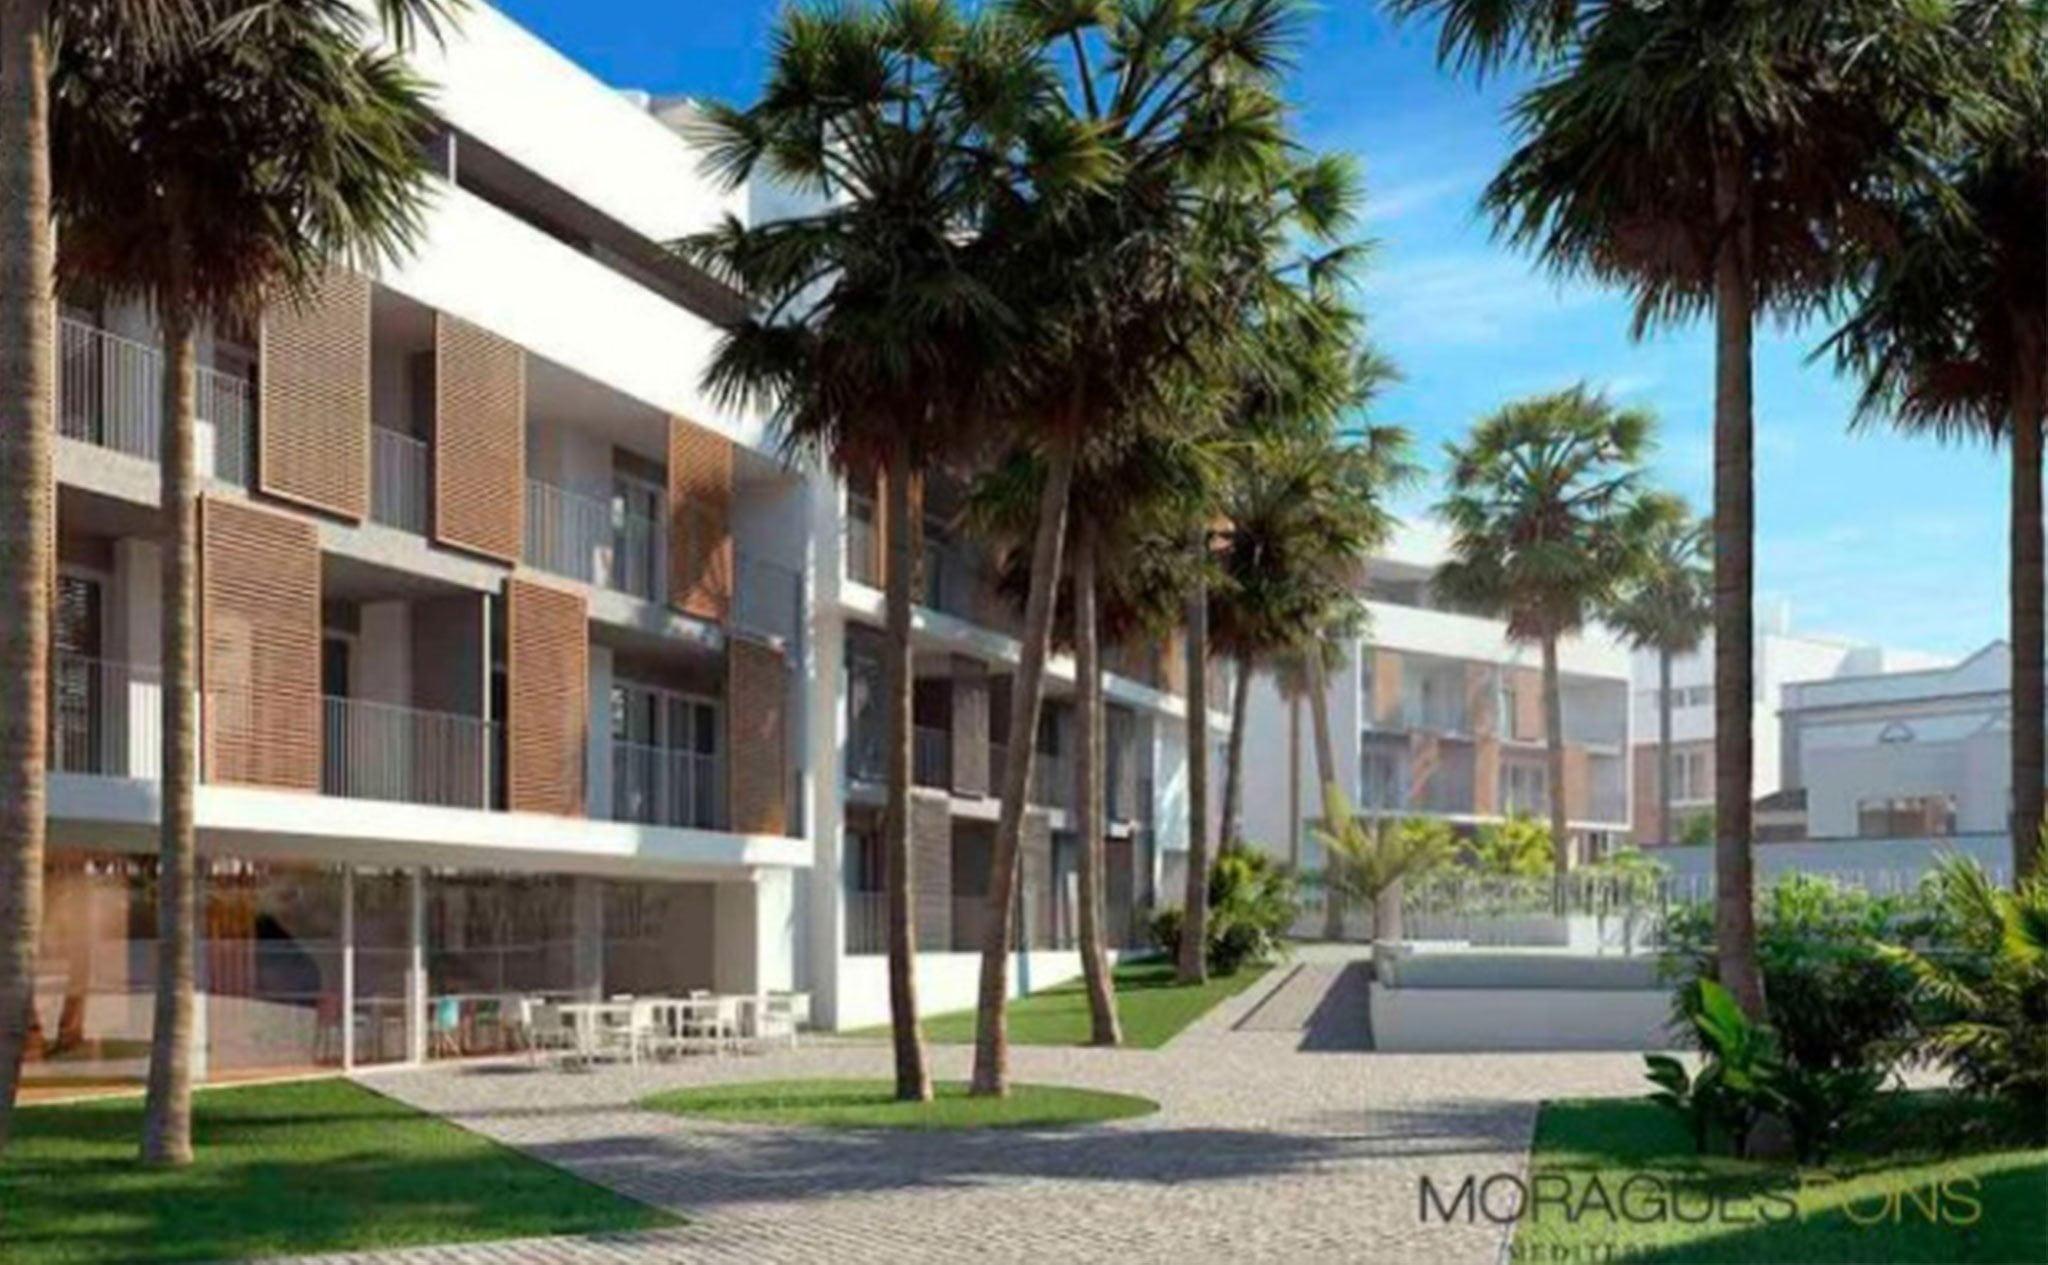 Exterior del Residencial Unic, obra nueva en Jávea – MORAGUESPONS Mediterranean Houses